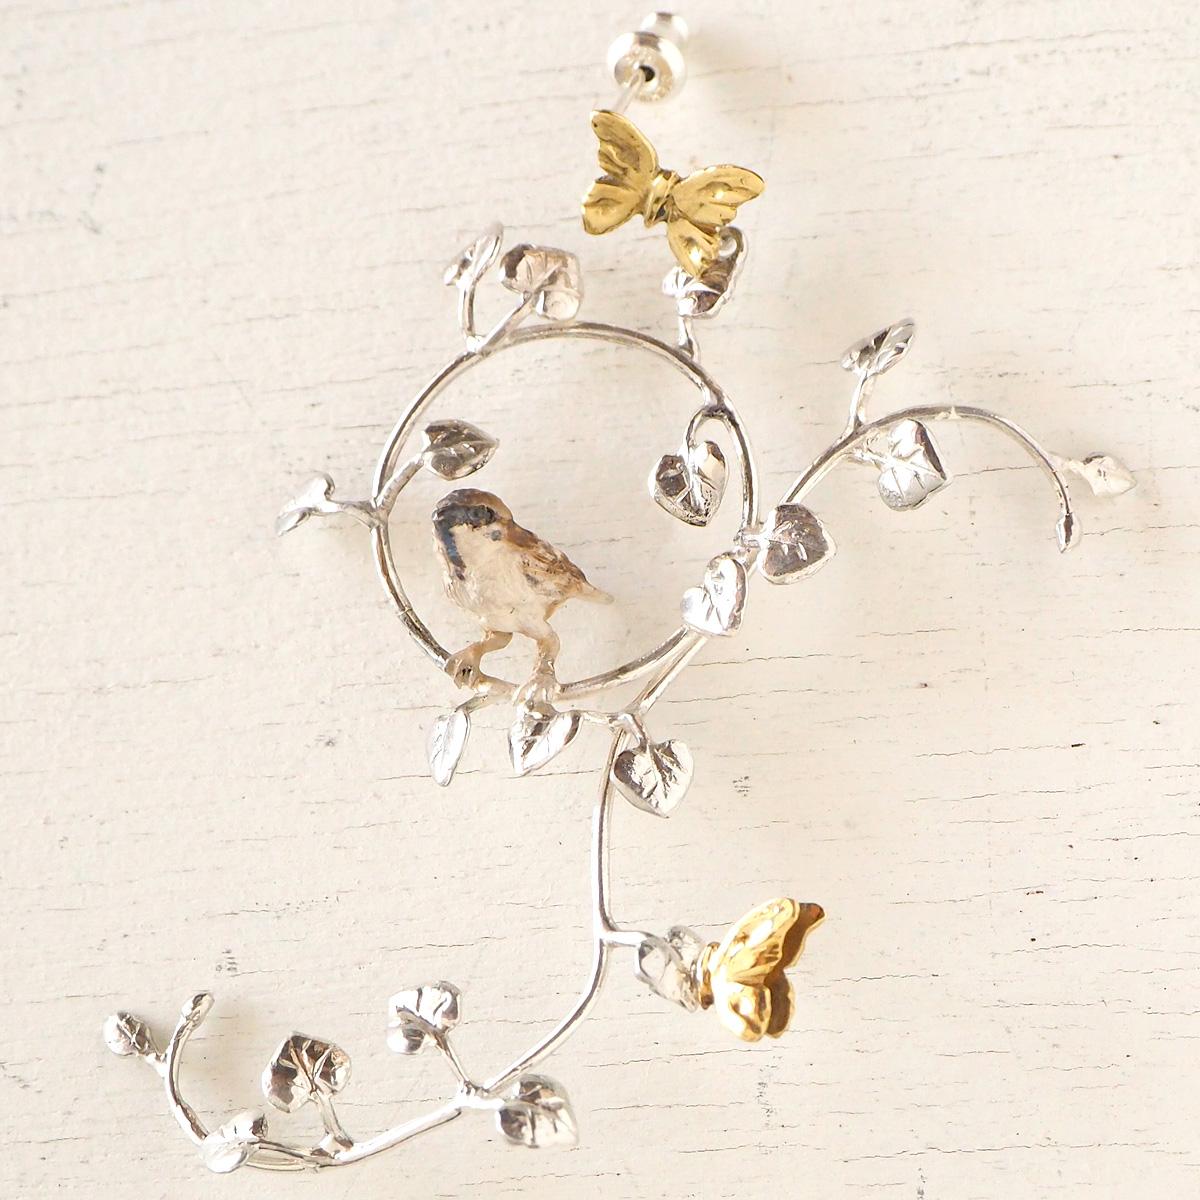 DECOvienya(デコヴィーニャ) 手作りアクセサリー スズメとつる草のピアス シルバー&真鍮 片耳 [DE-136]